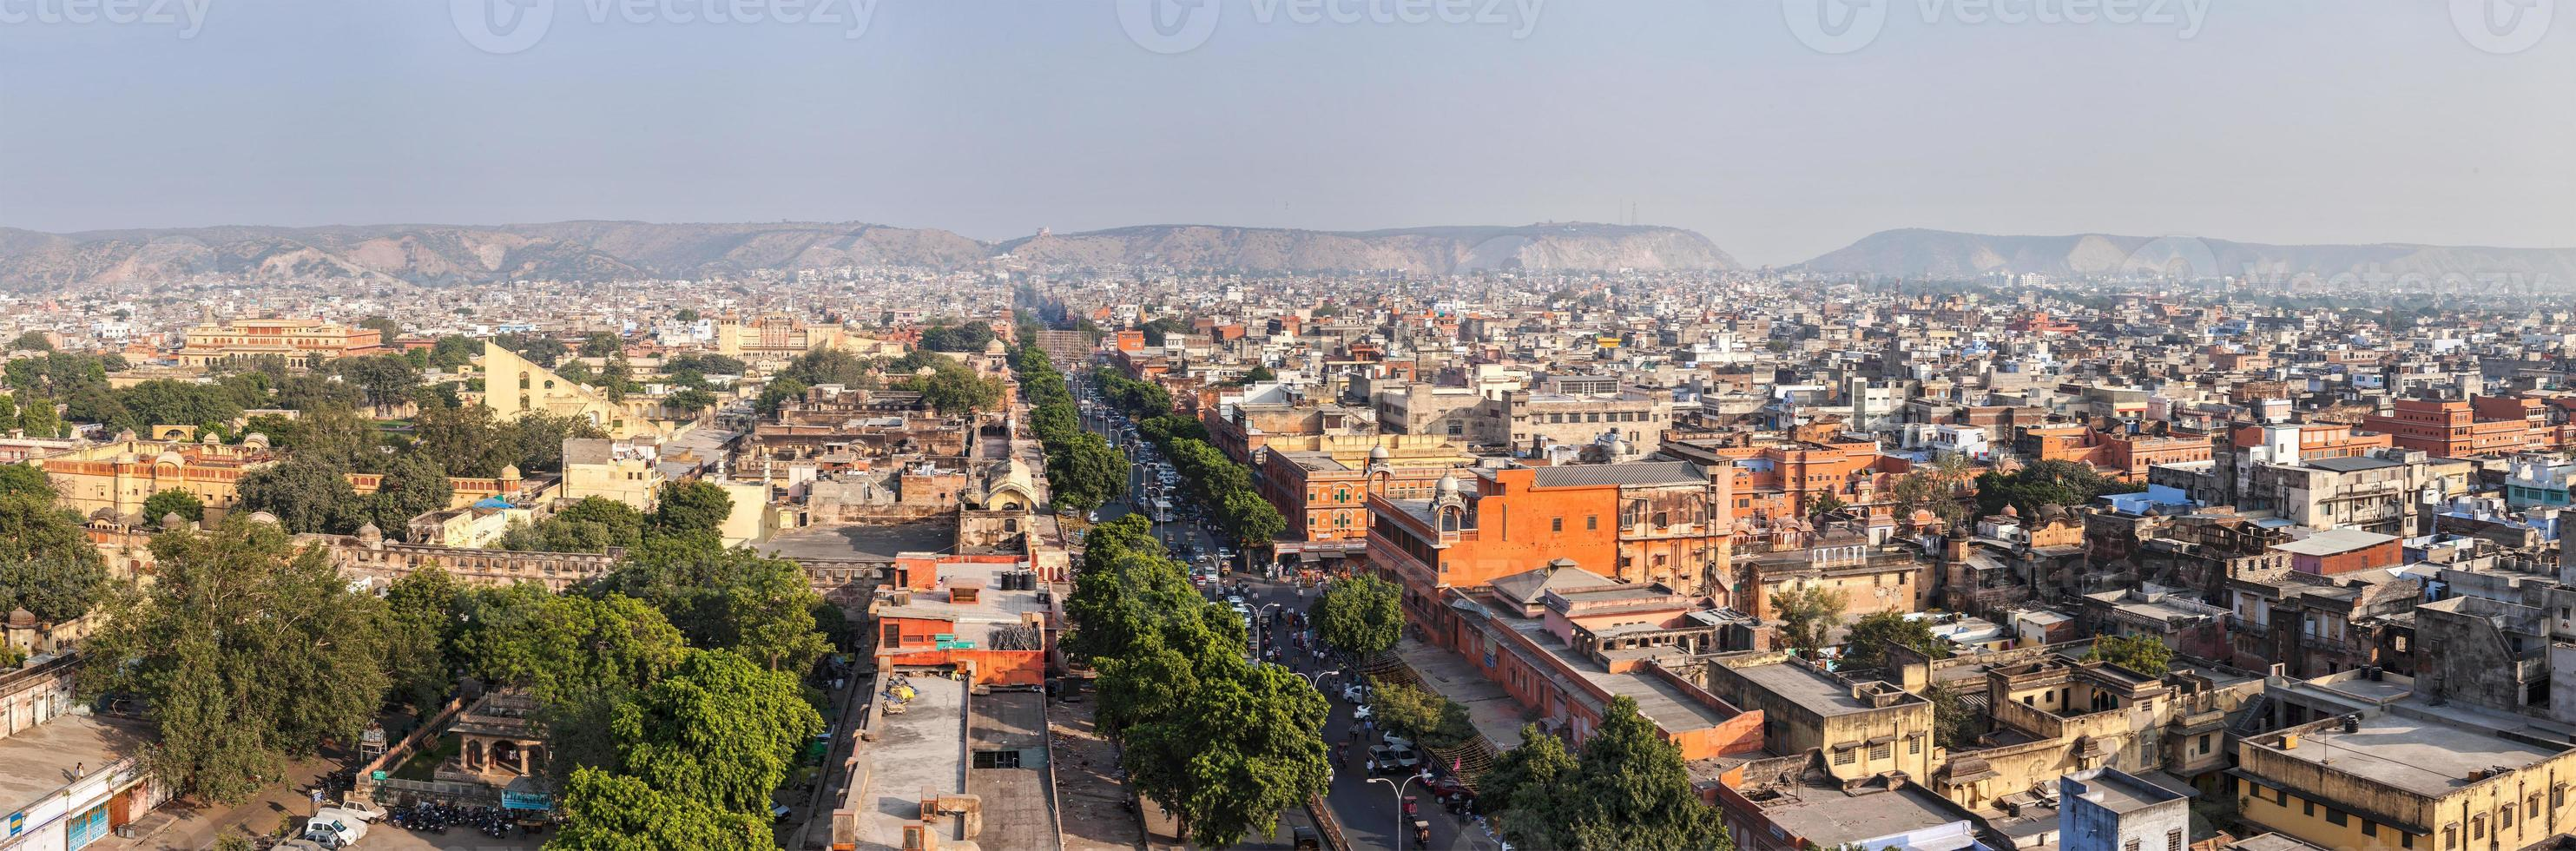 panorama da vista aérea de jaipur rajasthan, Índia foto